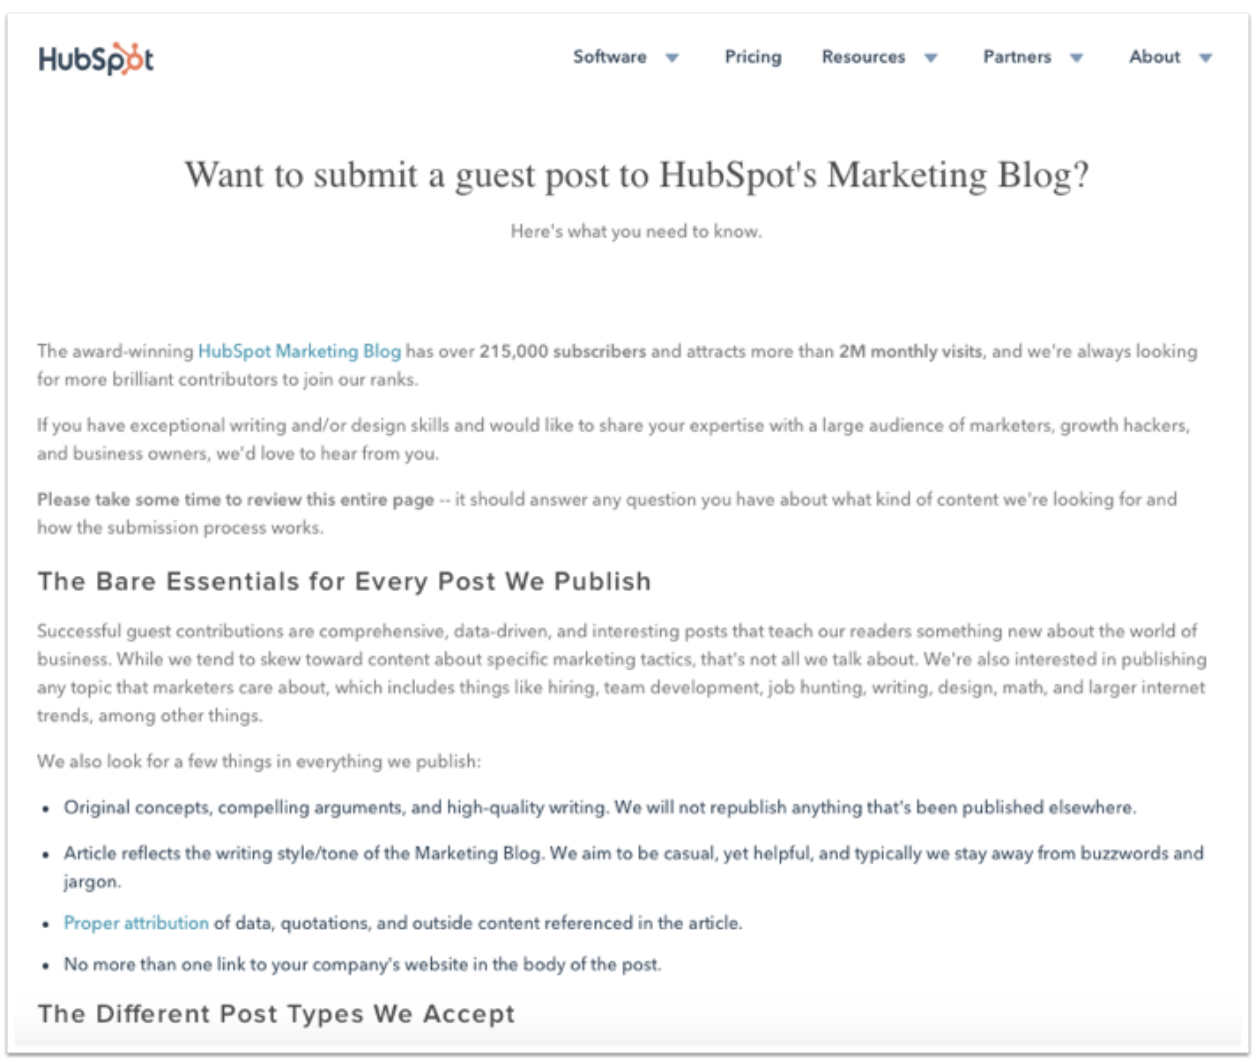 HubSpot's Guest Blogging Guidelines